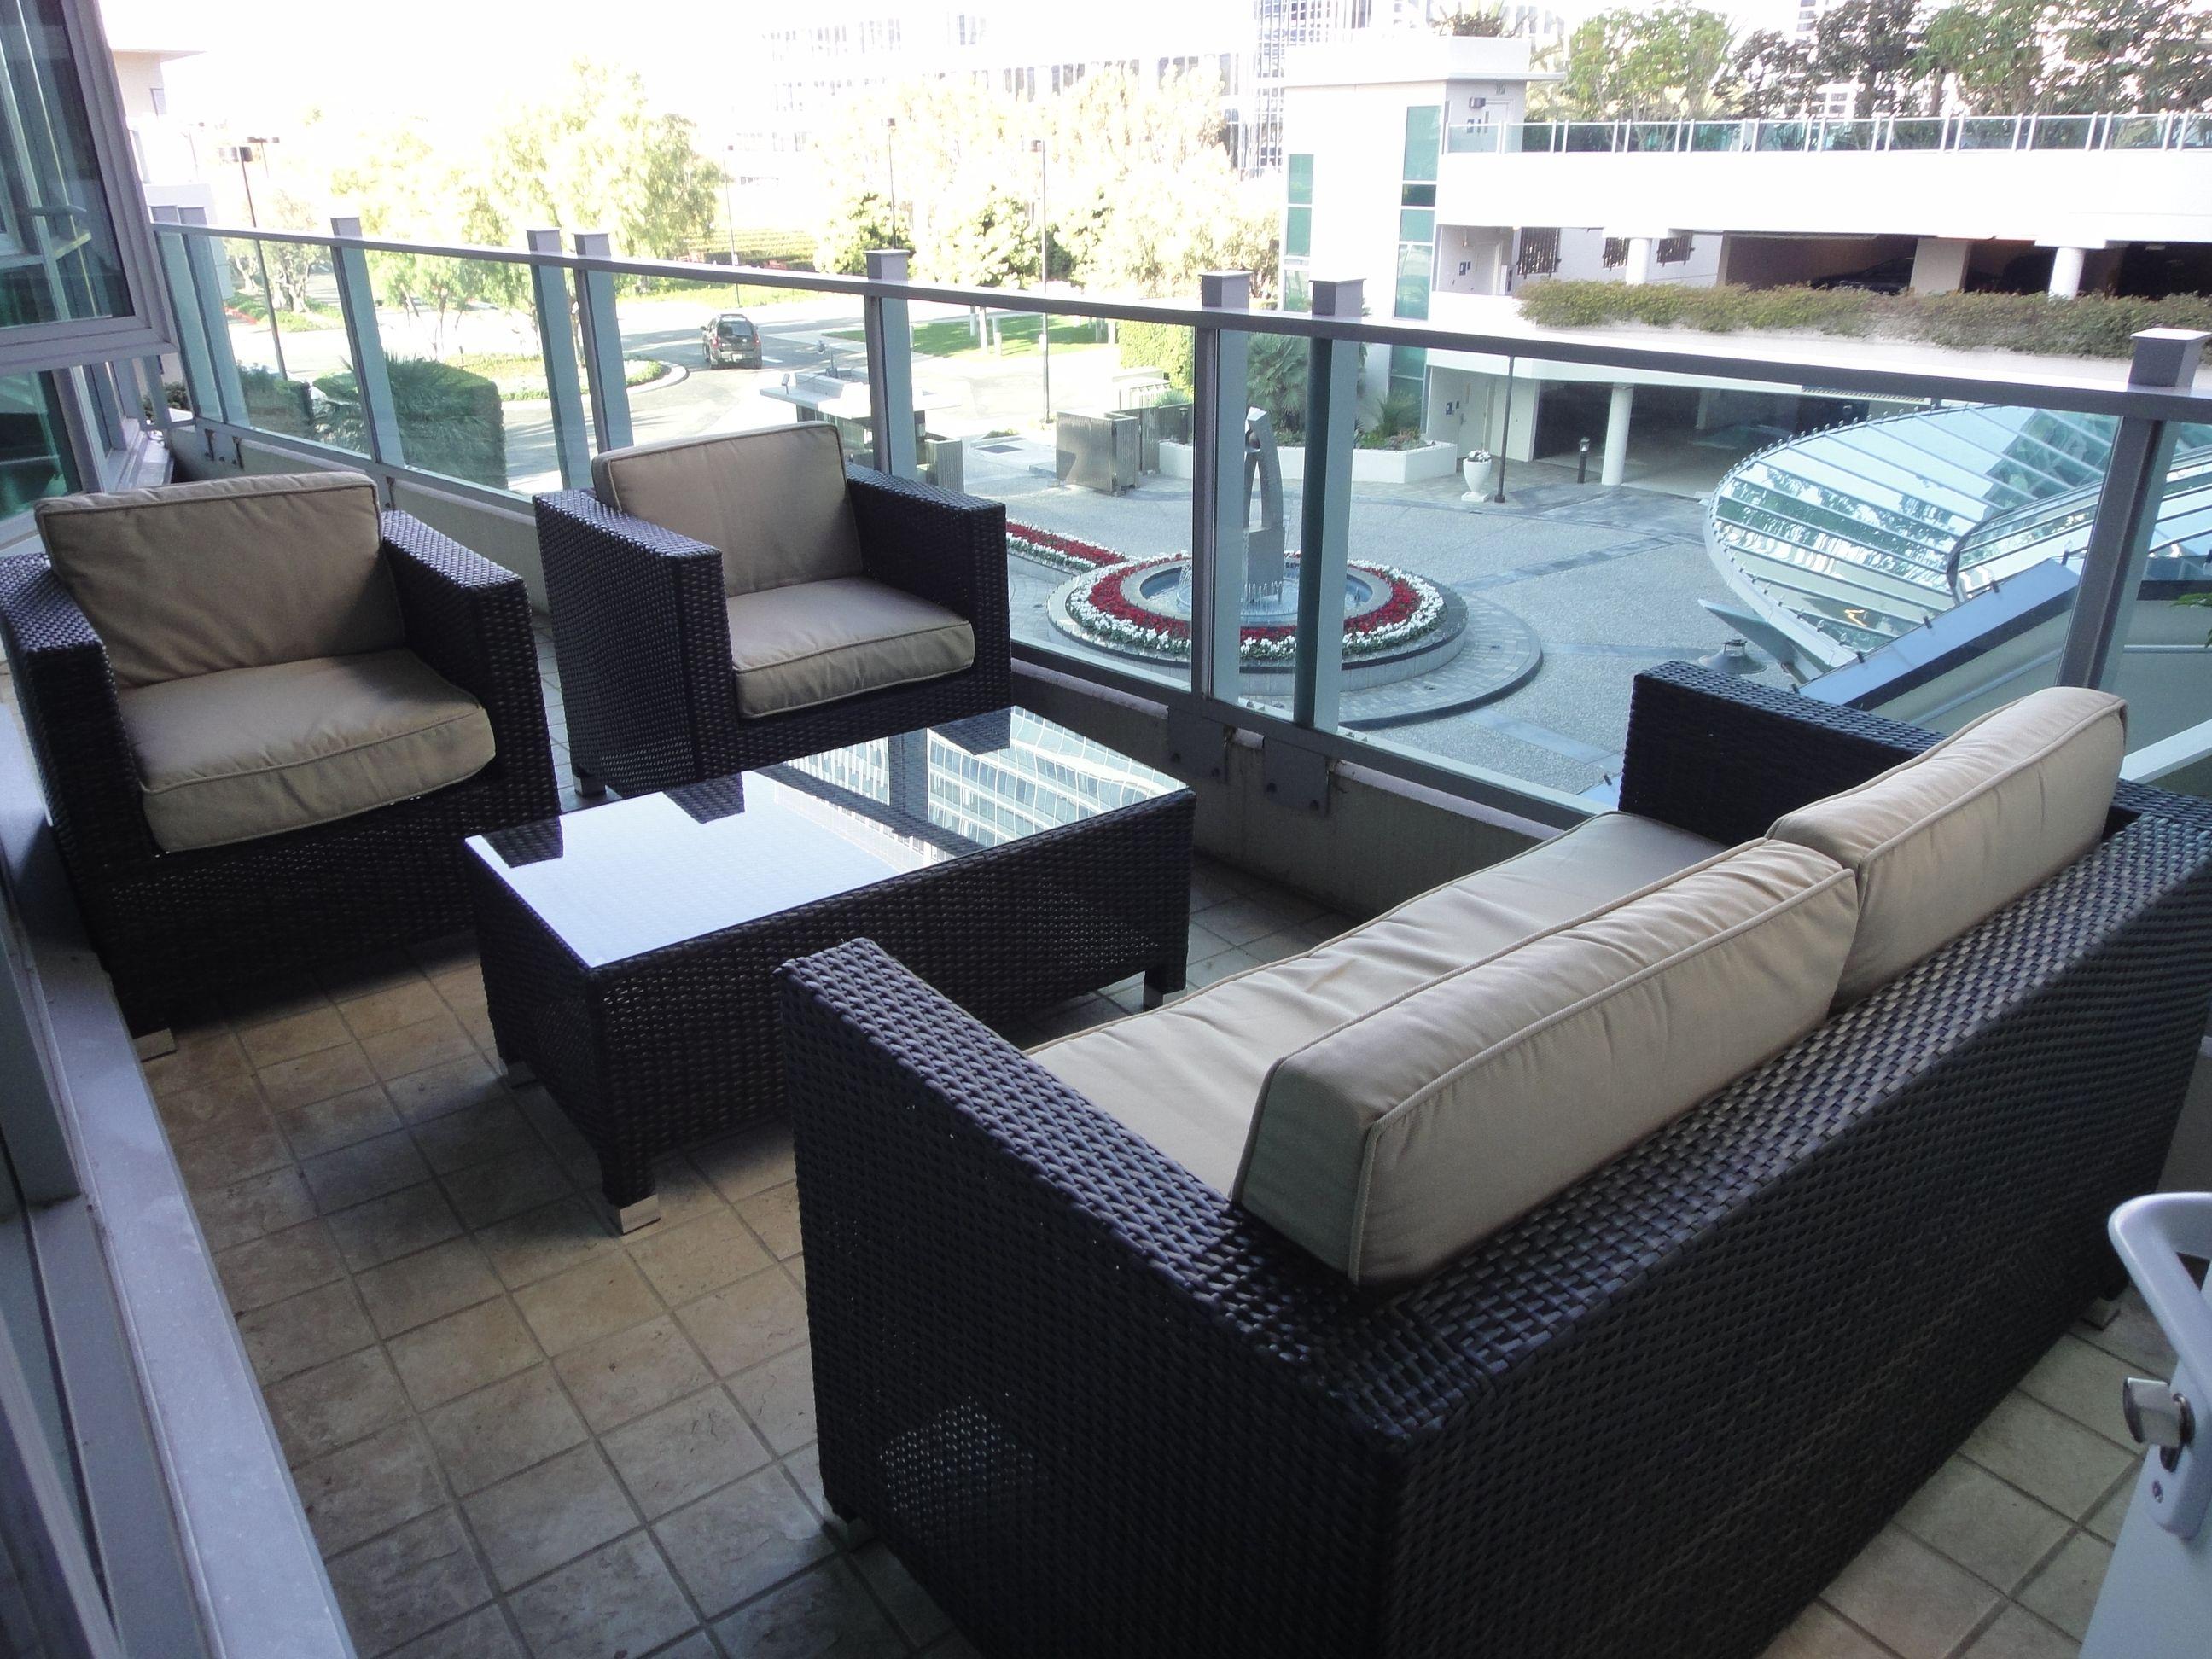 Balcony Patio Furniture Gardens Patios And Balconies Pinterest Balconies Patios And